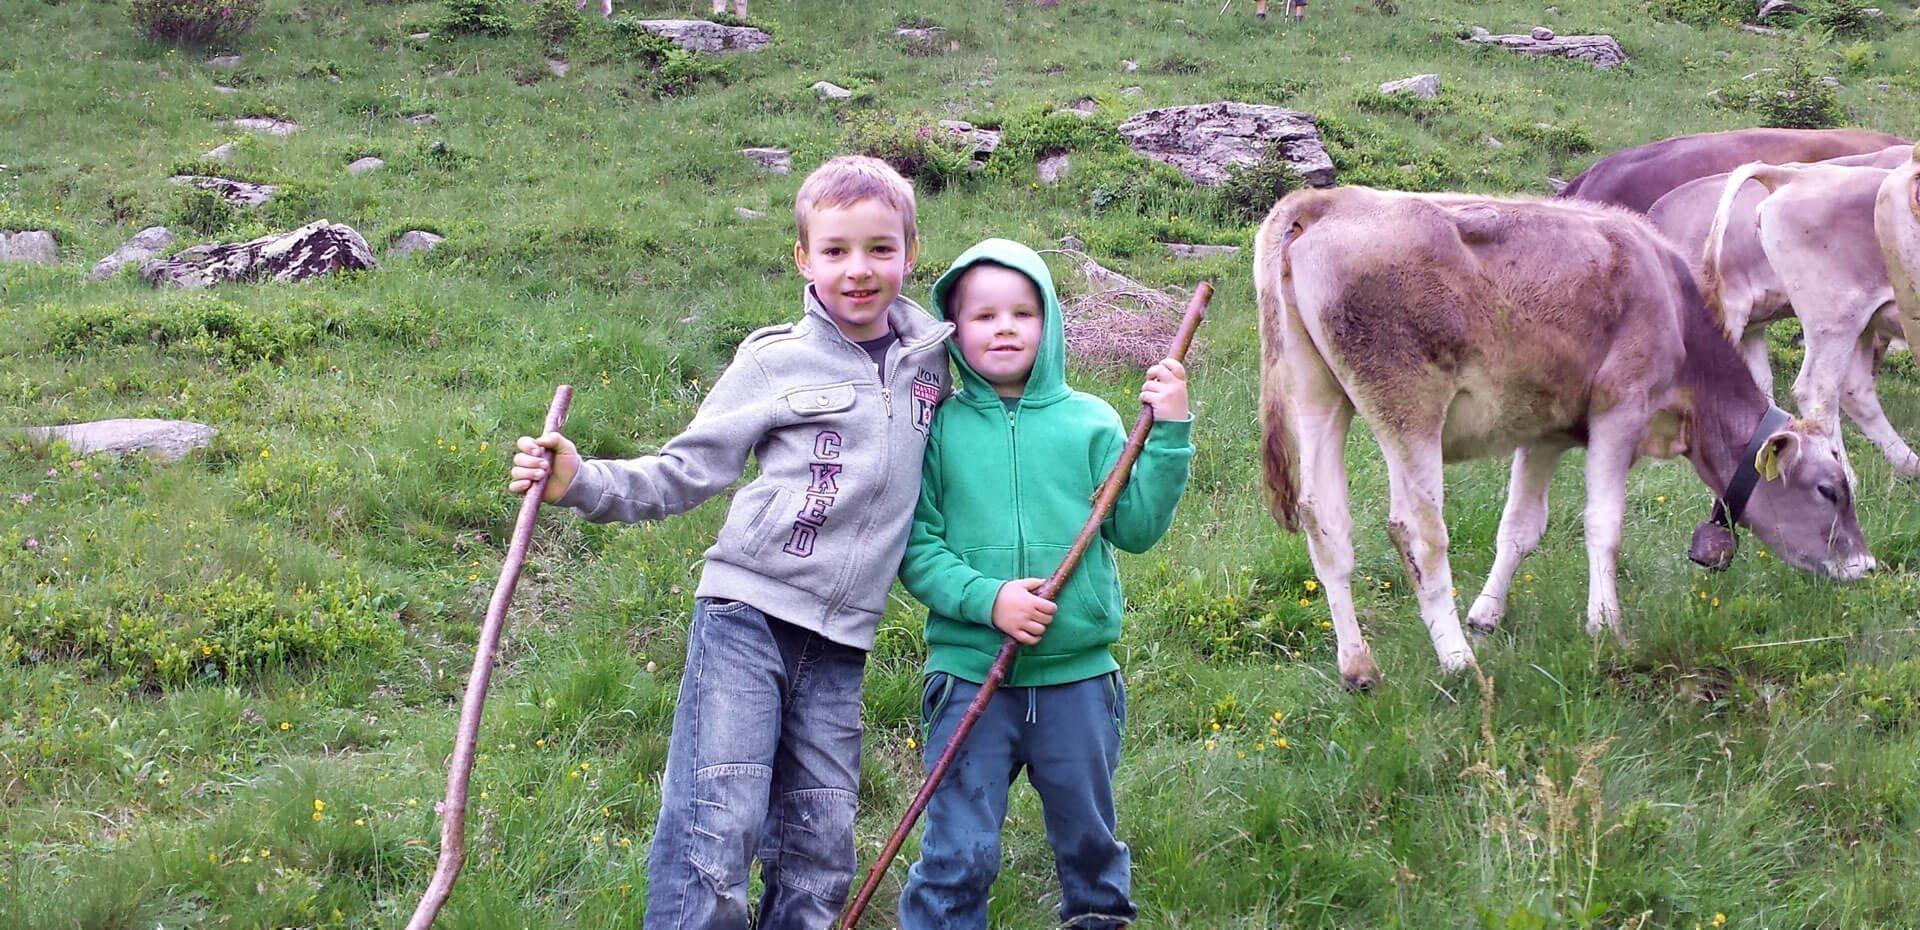 urlaub-auf-dem-familienbauernhof-suedtirol